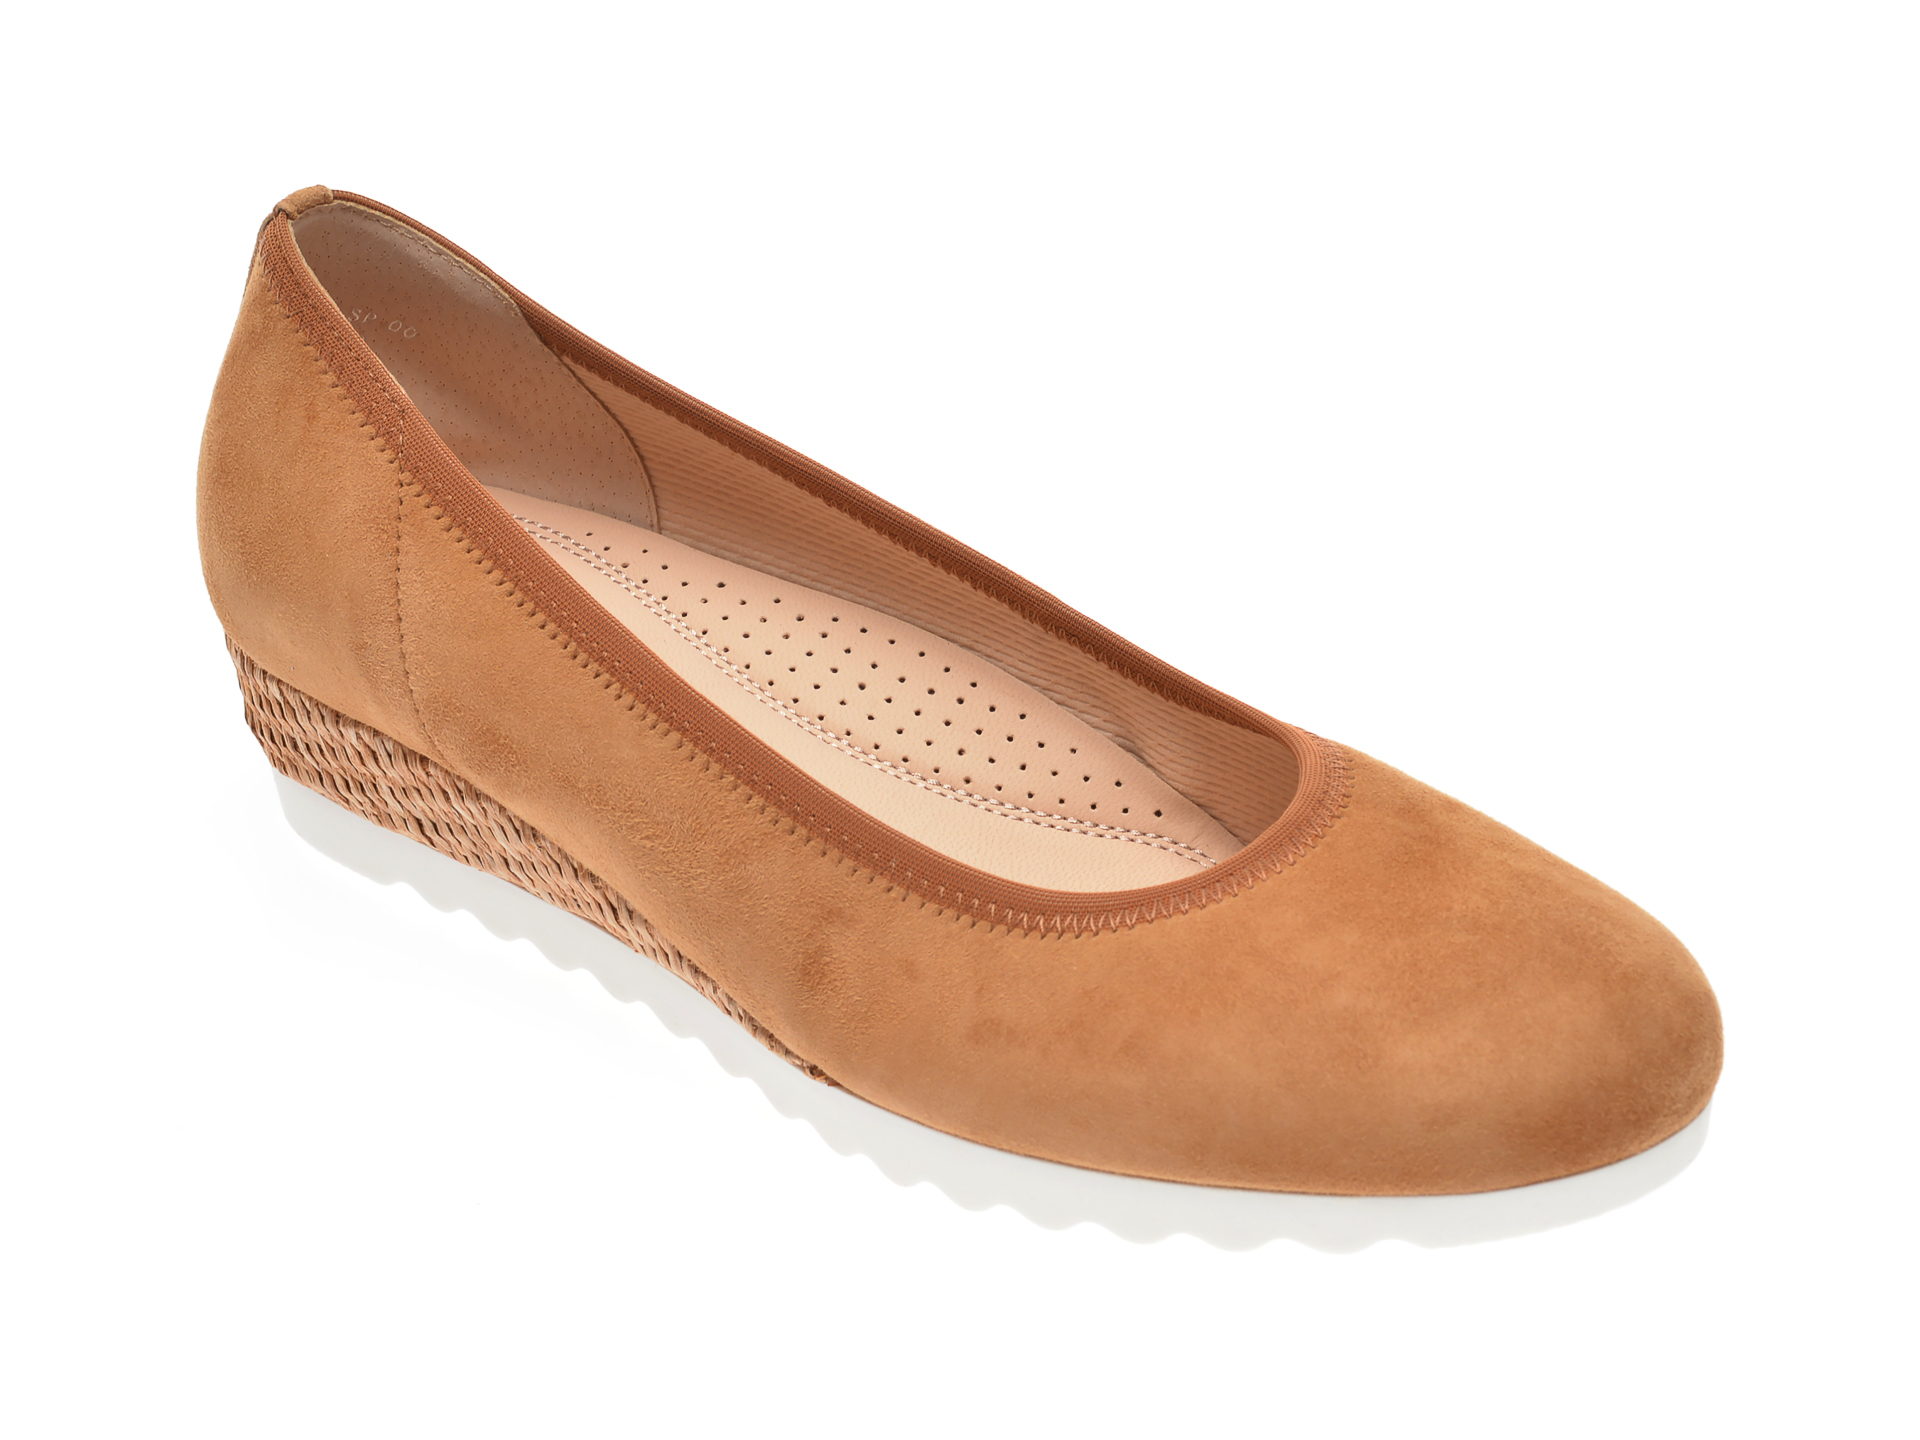 Pantofi GABOR maro, 42641, din piele intoarsa